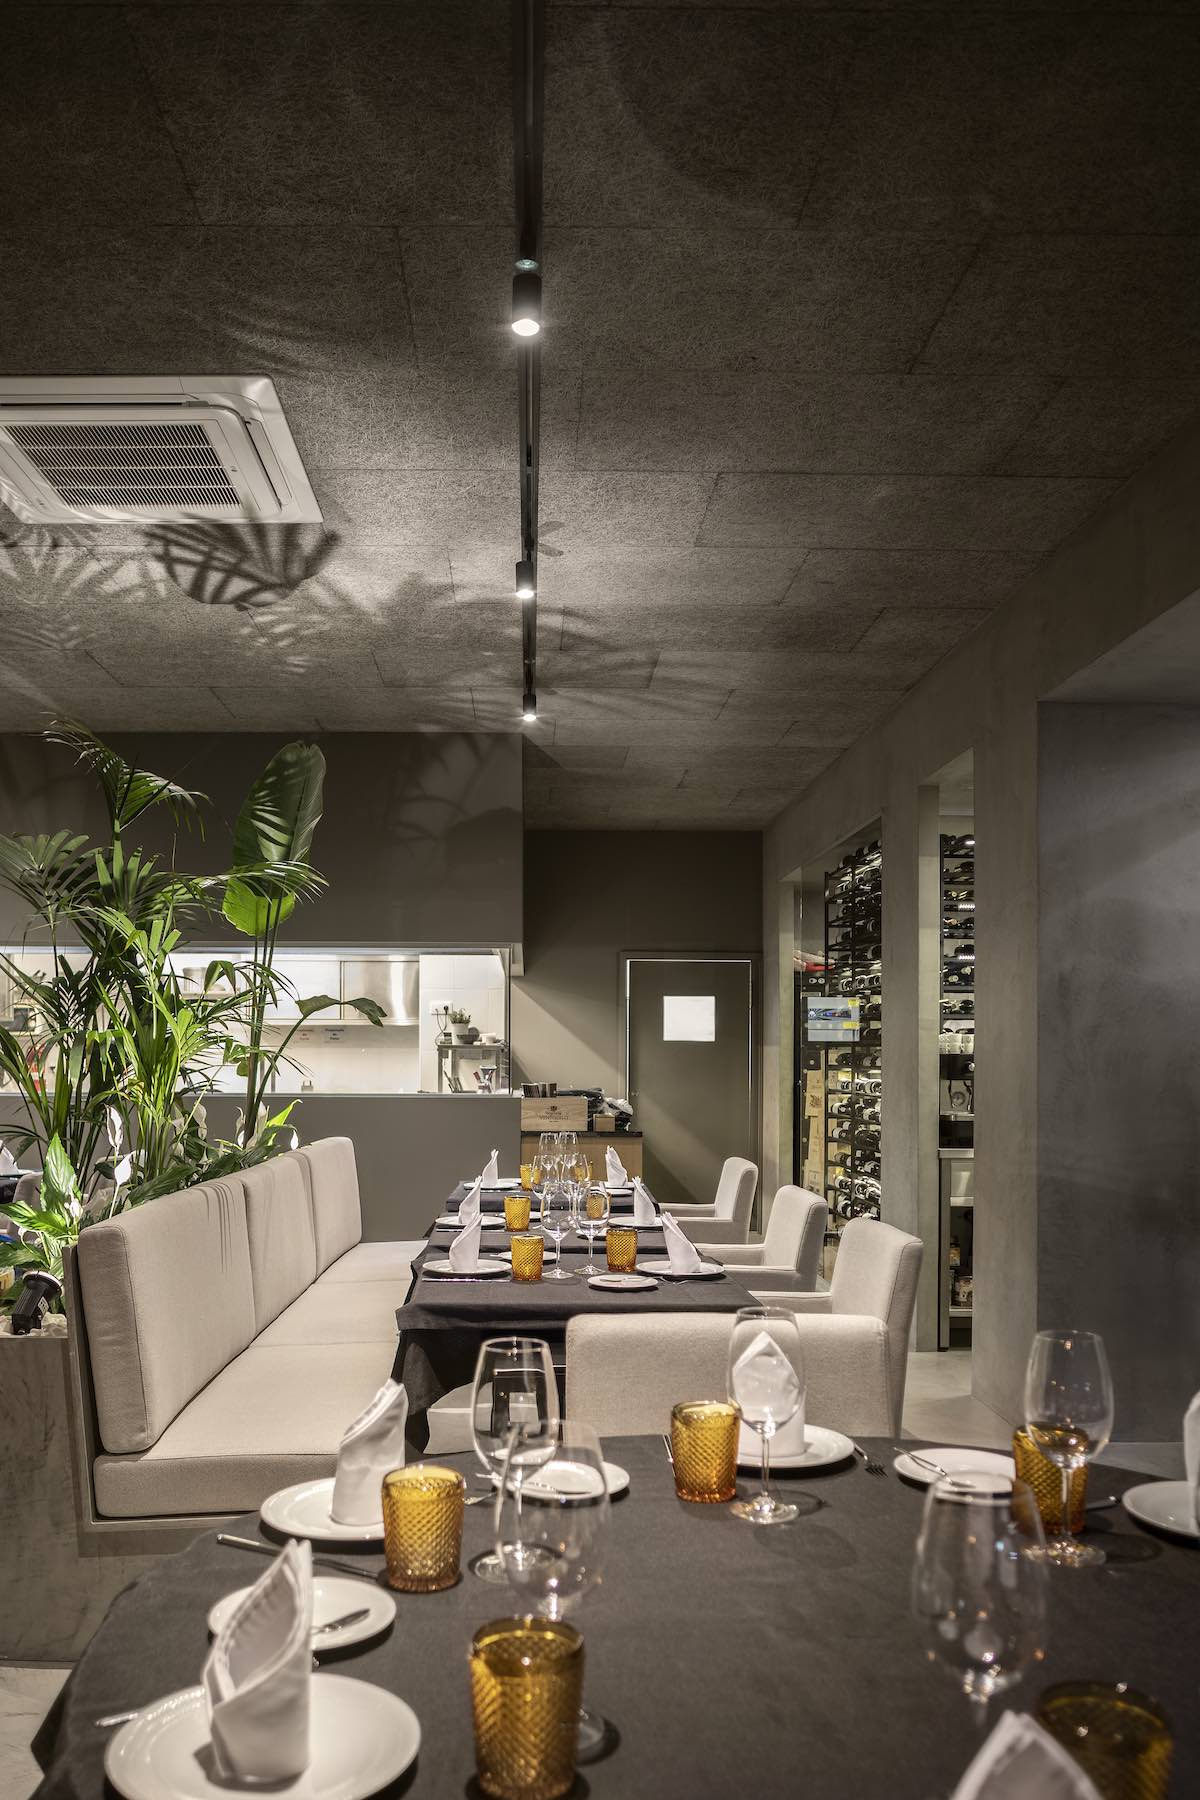 FAMA_Restaurant_Paulo_Martins_Arquitectura_and_design_AmazingArchitecture_%20030.jpg